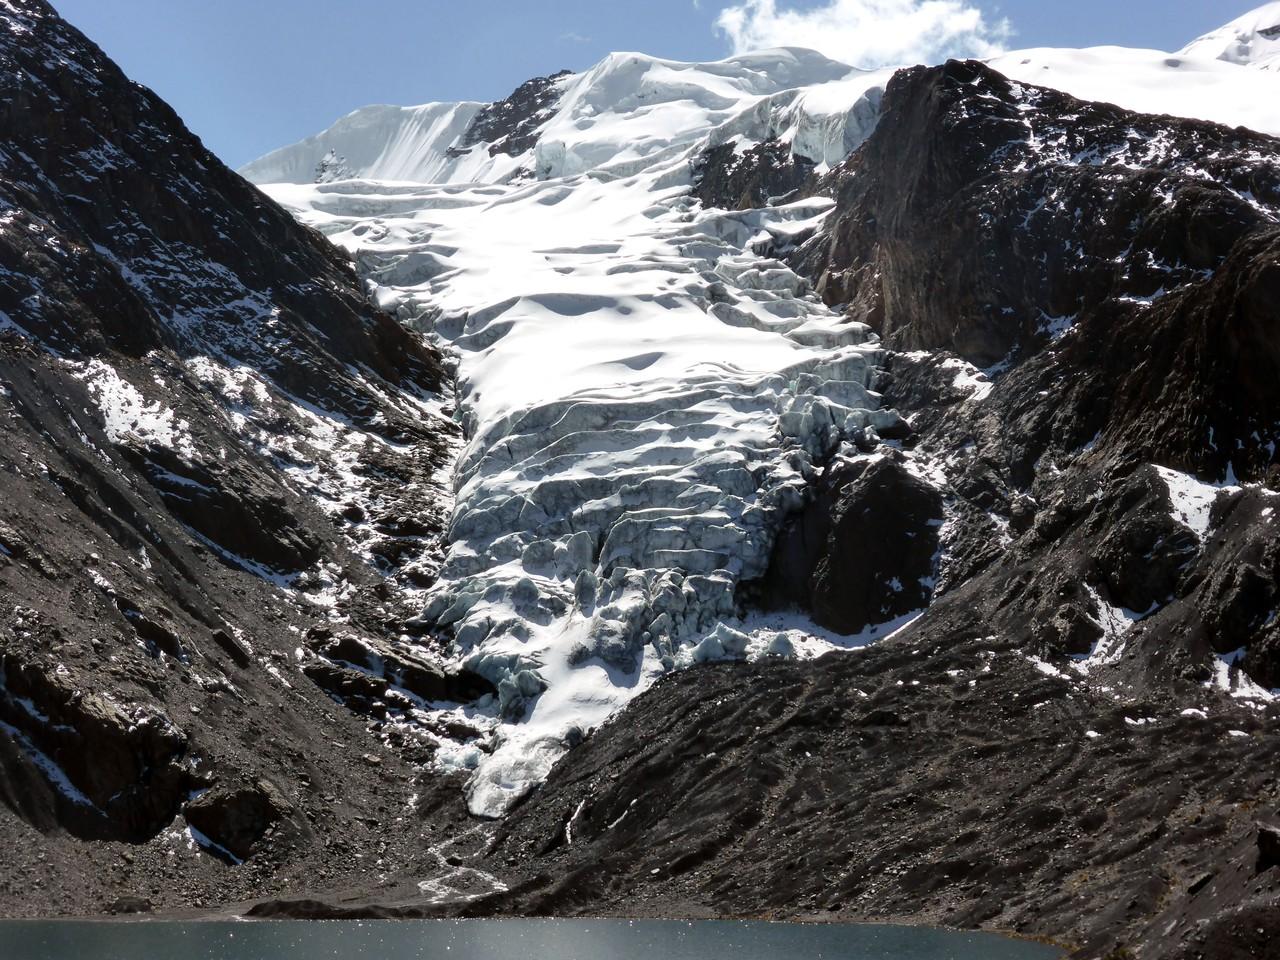 Receding glacier in the Bolivian Andes (2) (Credit: Simon Cook)